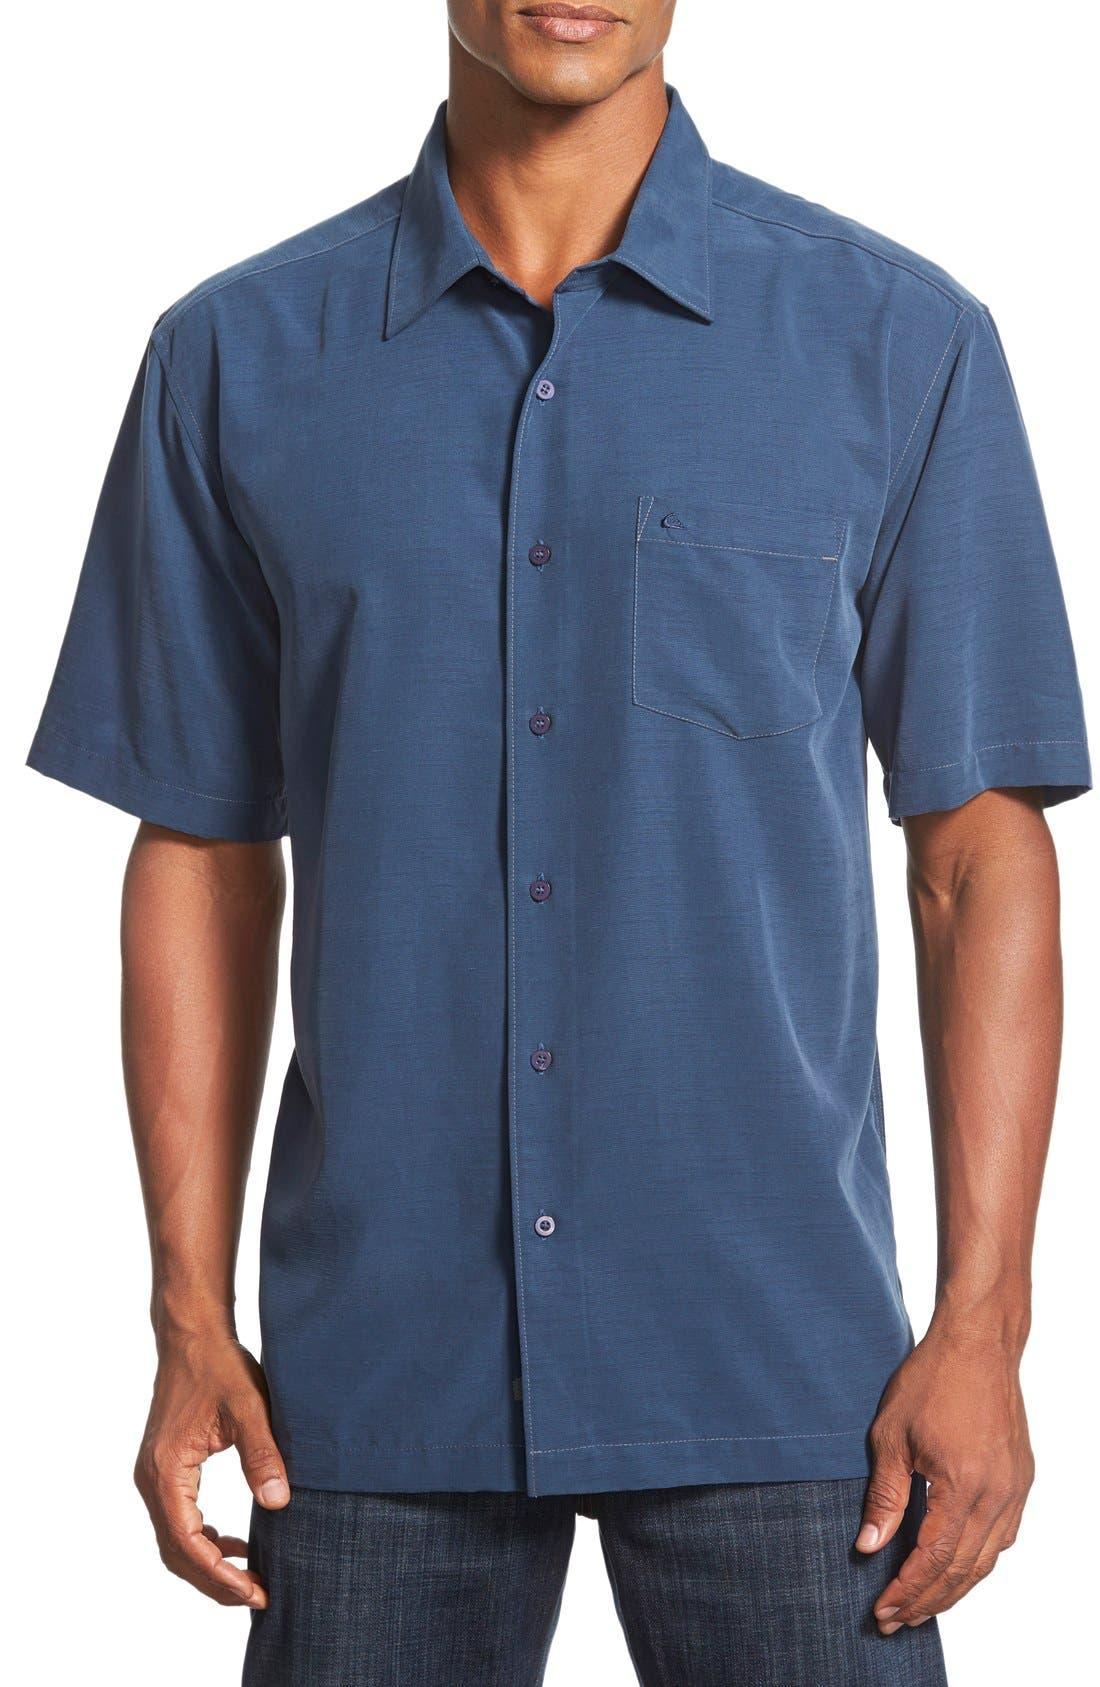 Quiksilver Waterman Collection 'Clear Days' Regular Fit Short Sleeve Sport Shirt